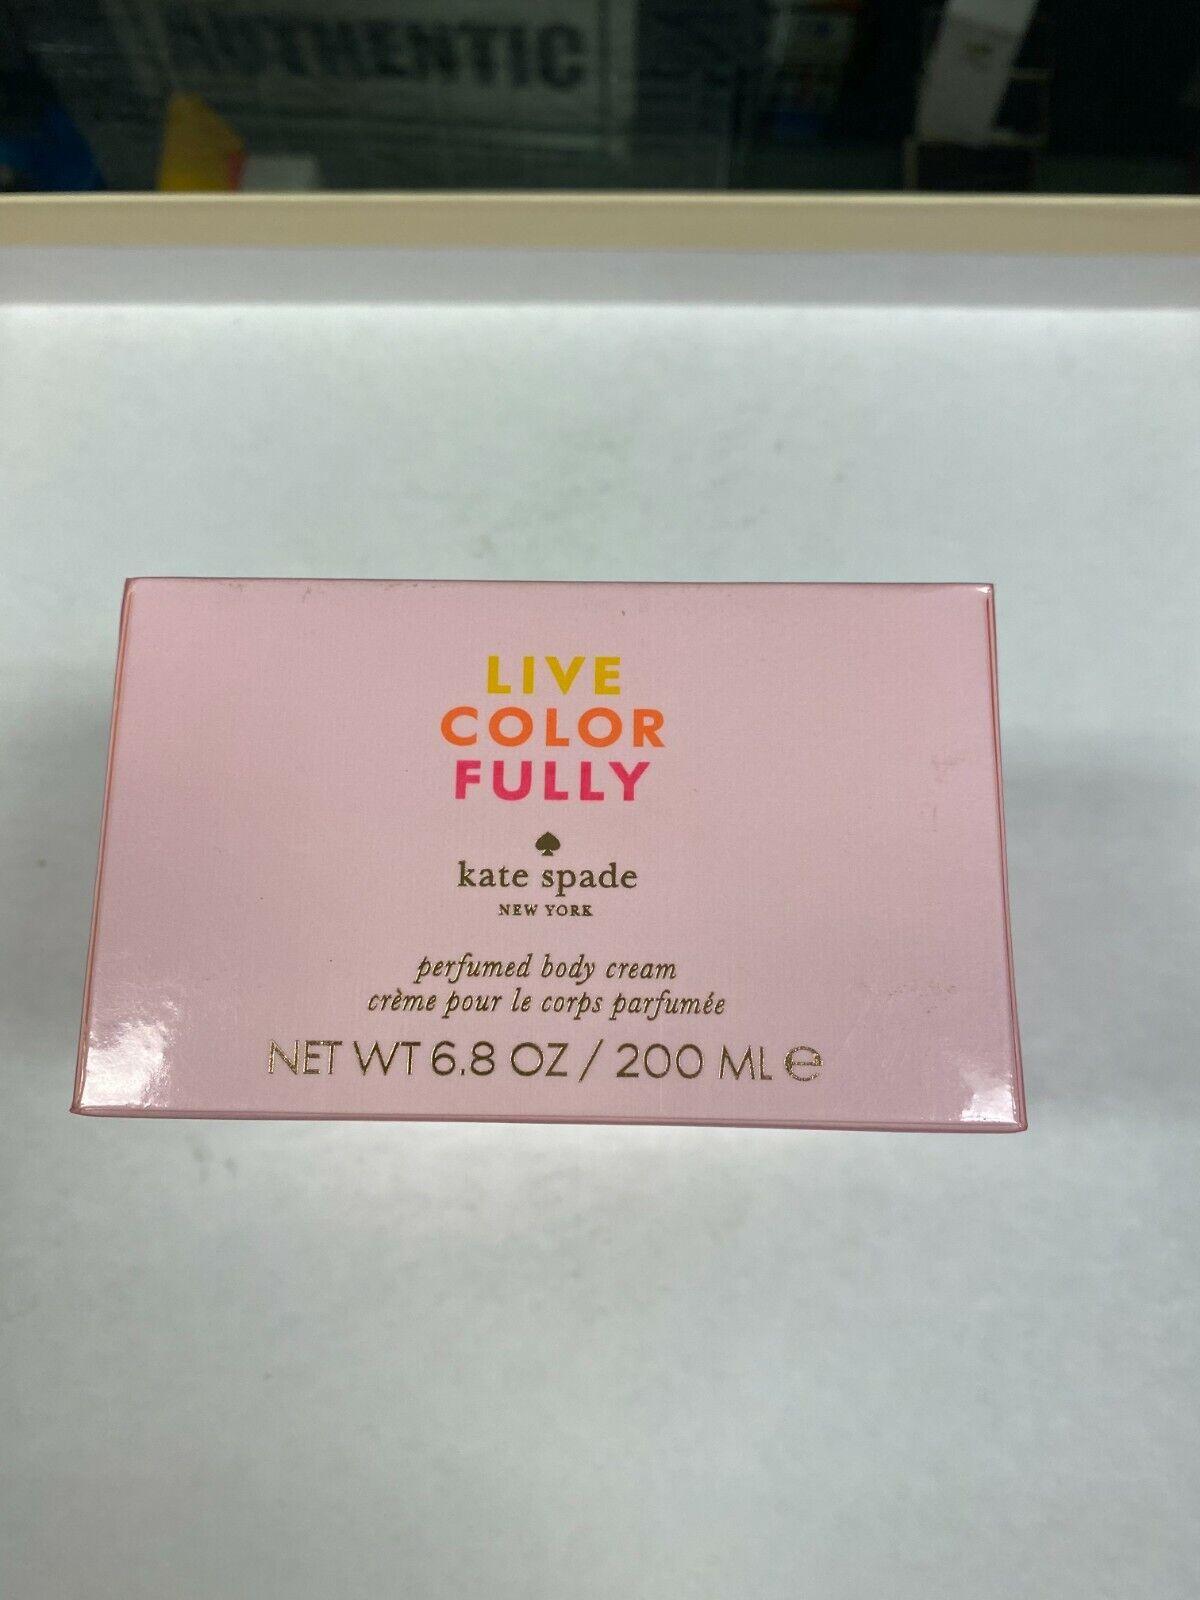 Love Color Fully By Kate Spade Perfumed Body Cream 6.8 Fl Oz  - $72.50